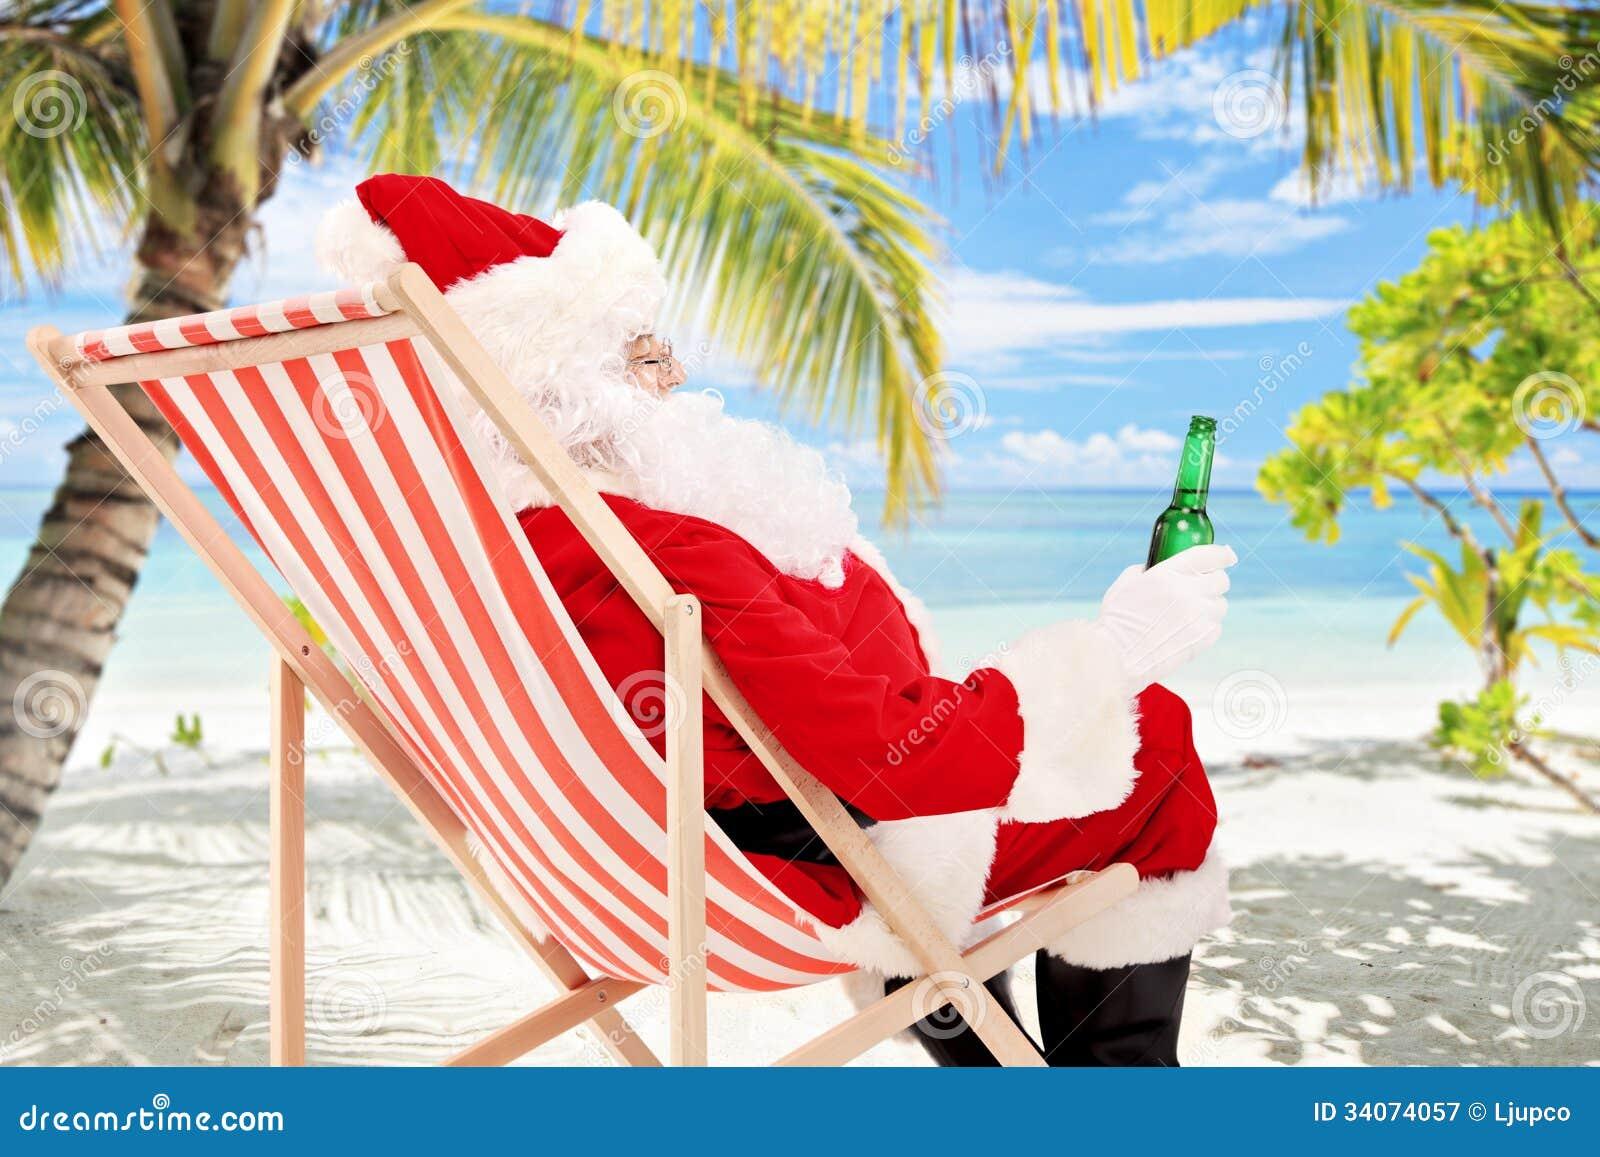 free clipart santa on the beach - photo #38